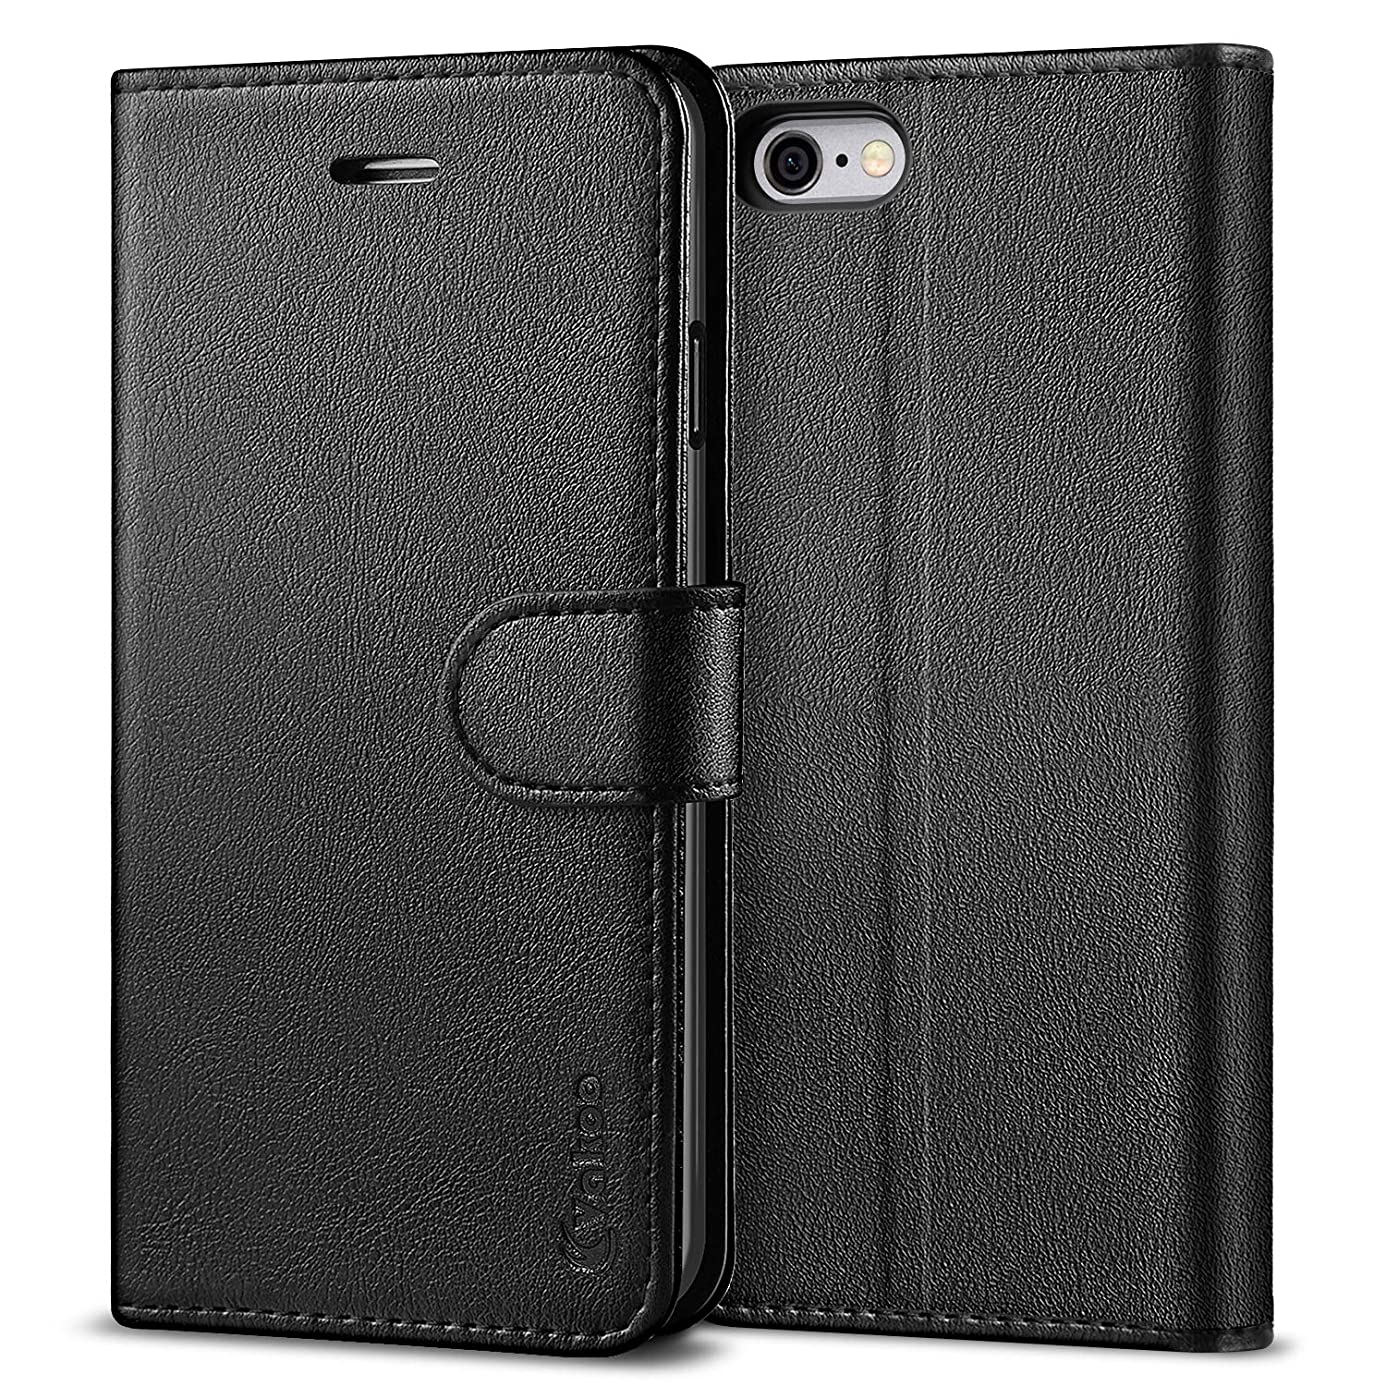 Wallet Case for iPhone 6 Plus/iPhone 6S Plus, Vakoo Premium Flip Case and PU Leather Phone Cover for Apple iPhone 6S Plus/6 Plus (5.5